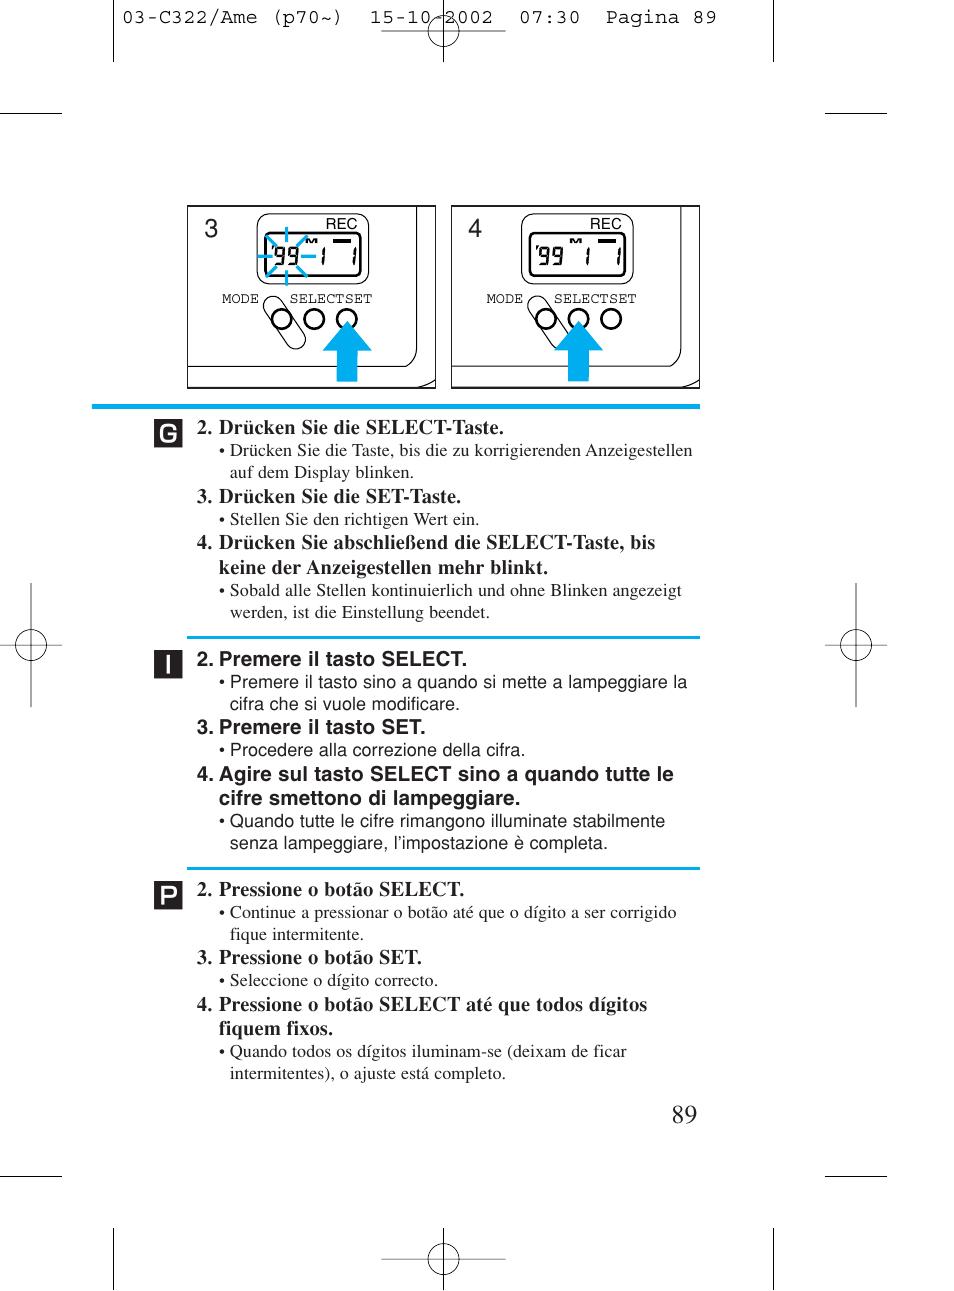 canon prima bf 80 set user manual page 89 115 original mode rh manualsdir com prima user manual prima 100 lwd user manual